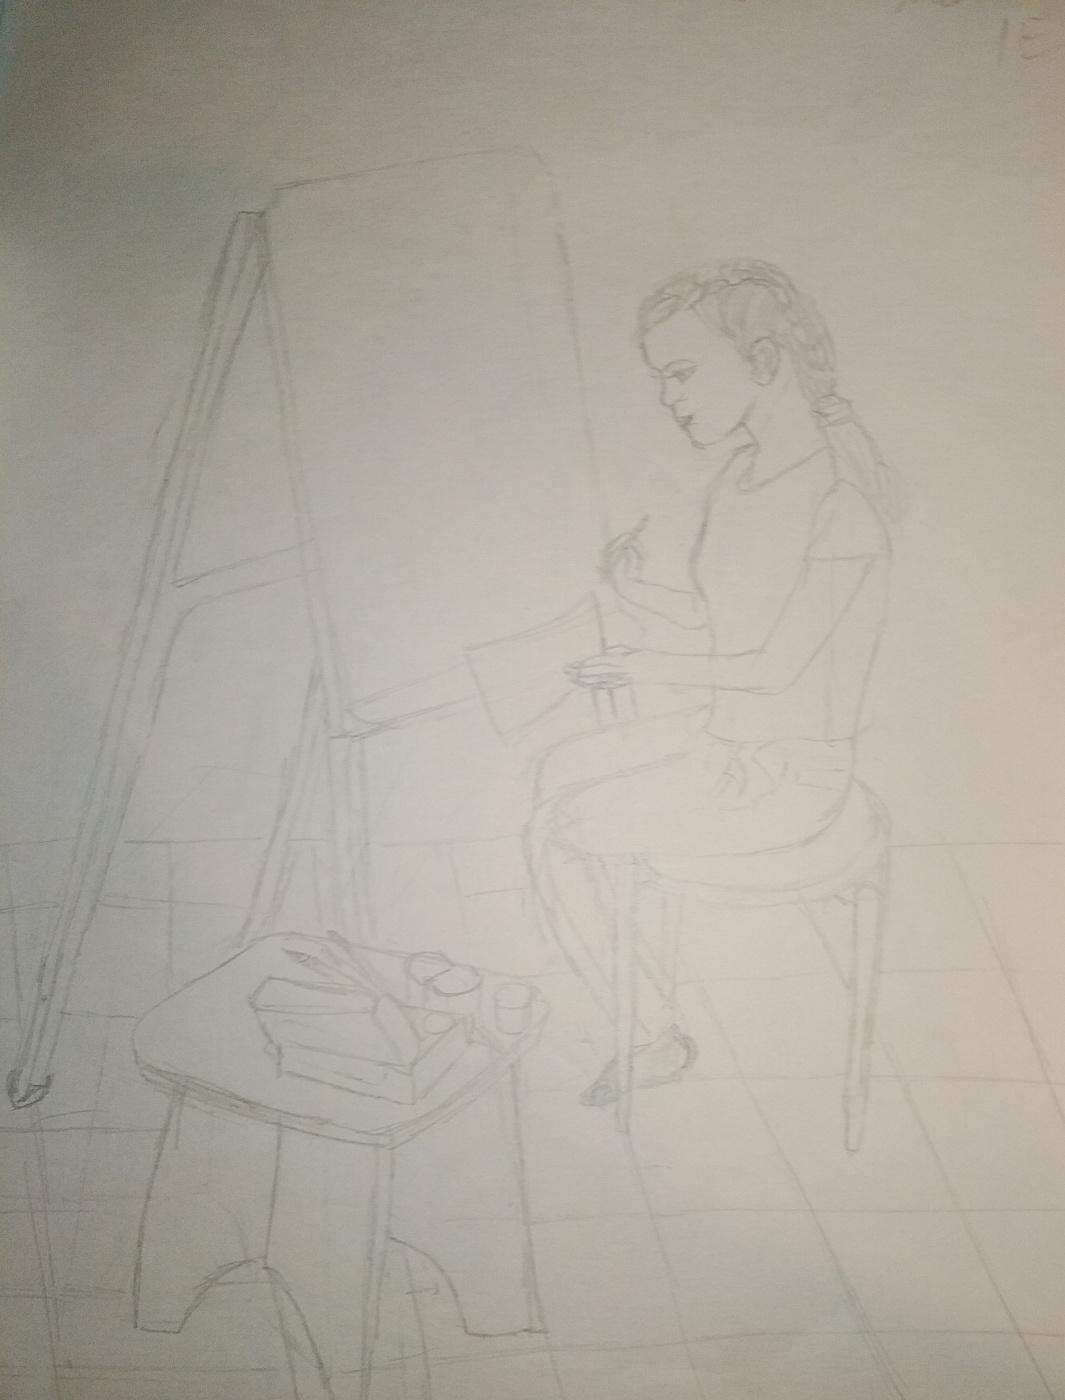 Zina Vladimirovna Parisva. Girl. Figure sketch